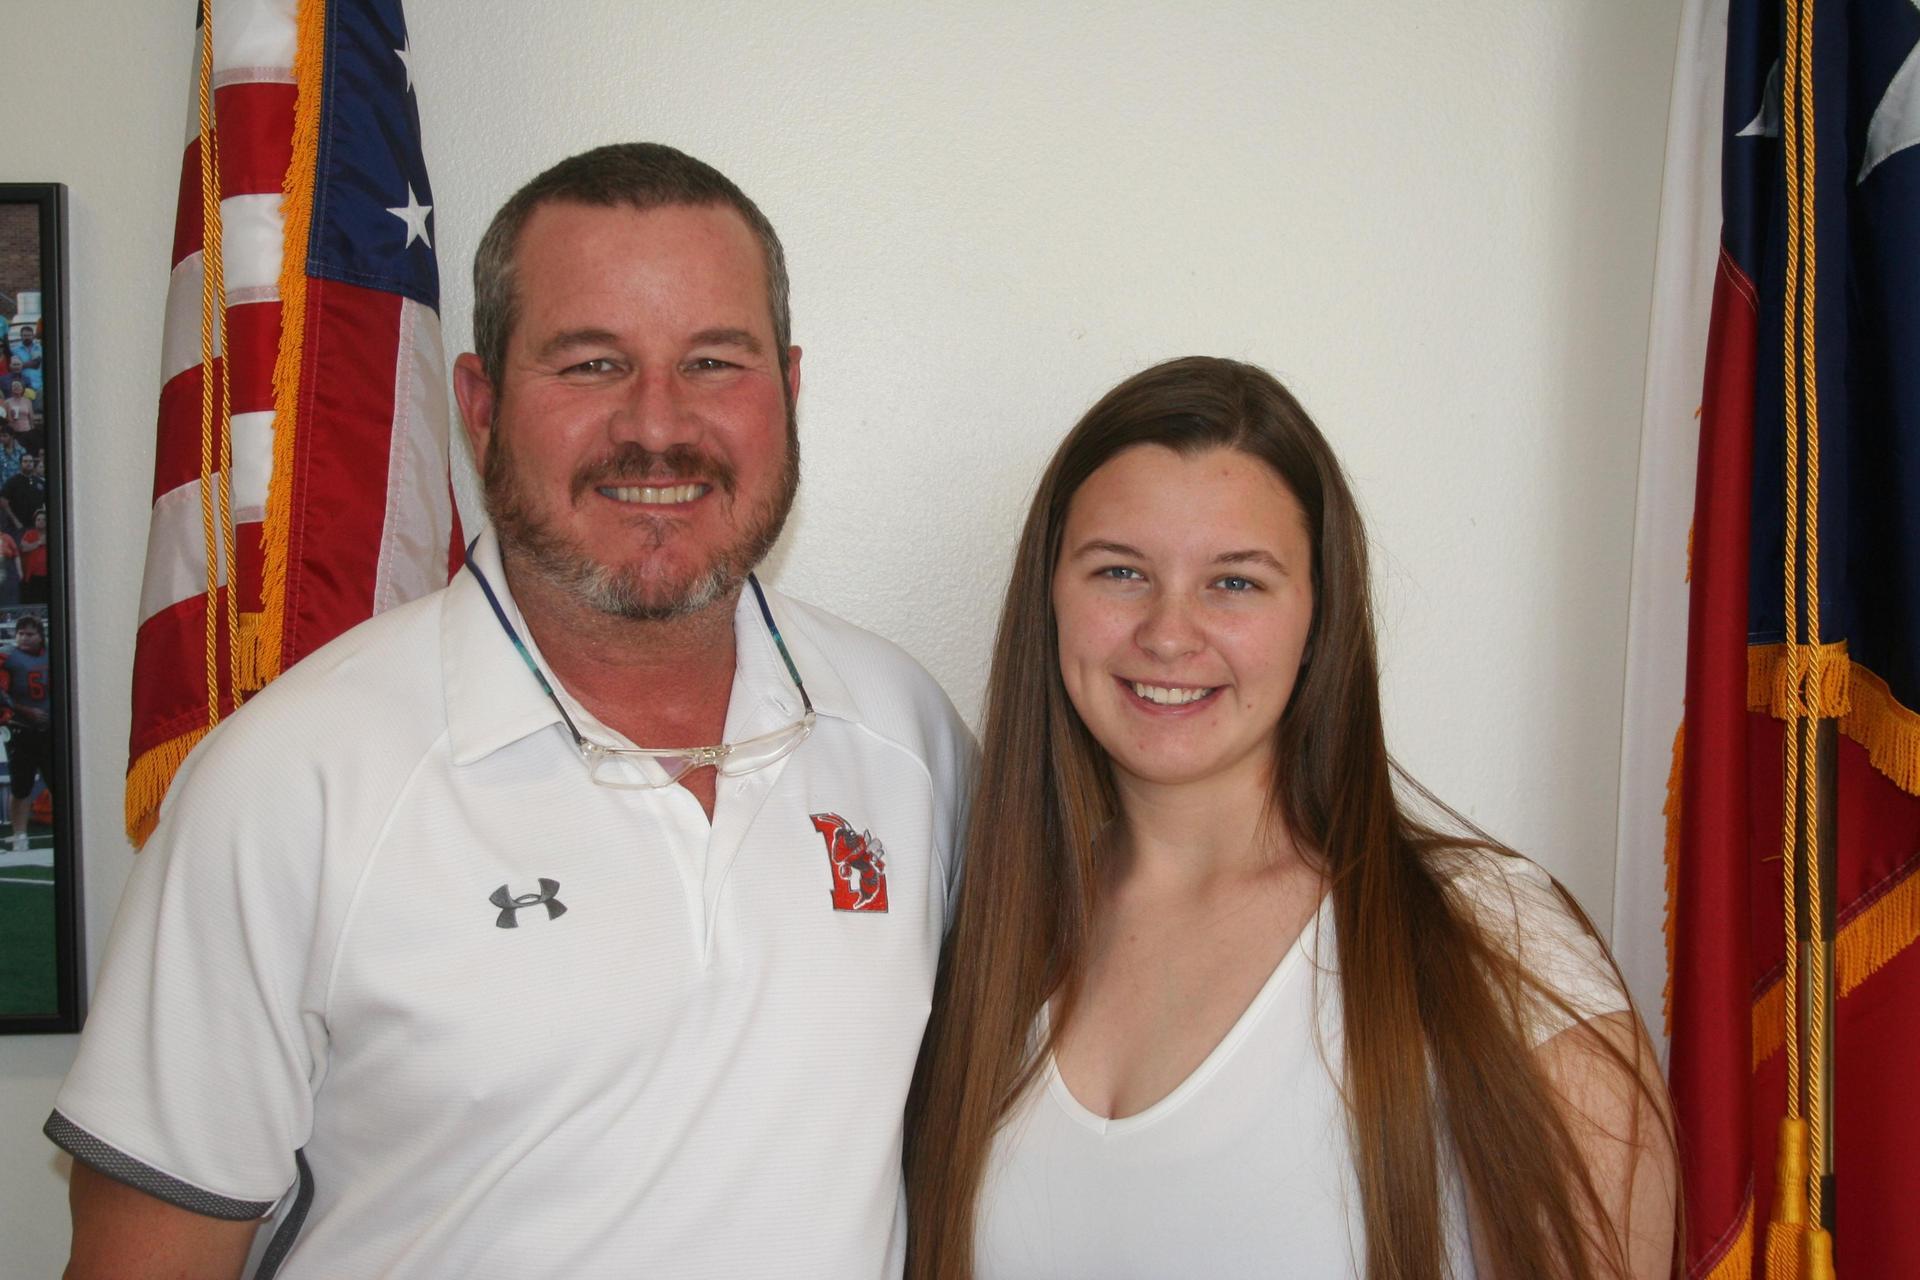 Mr. Payne and Kadi Sanderson